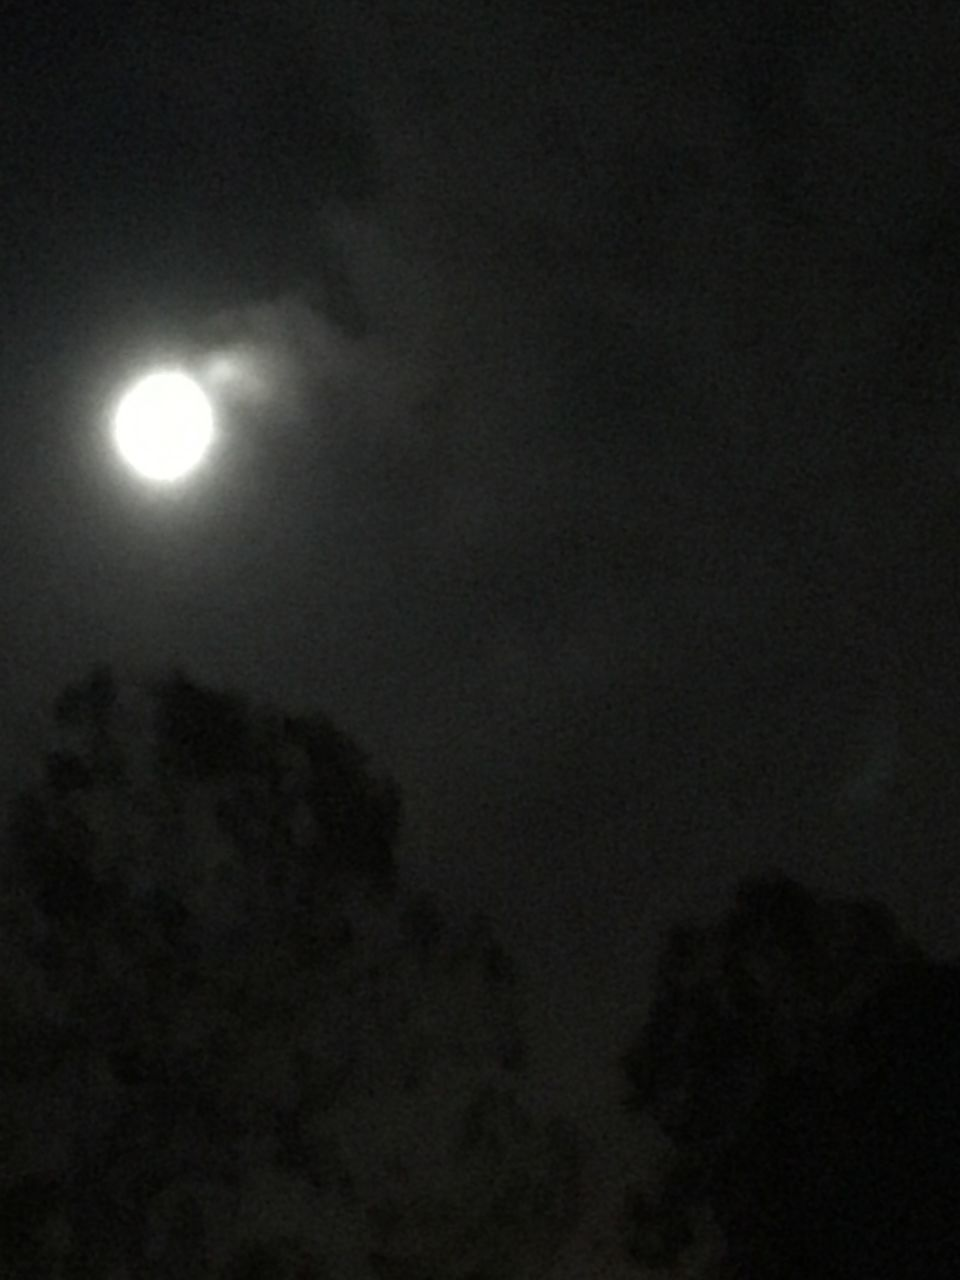 moon, night, moonlight, dark, astronomy, sky, illuminated, cloud - sky, no people, space, solar eclipse, spooky, outdoors, nature, half moon